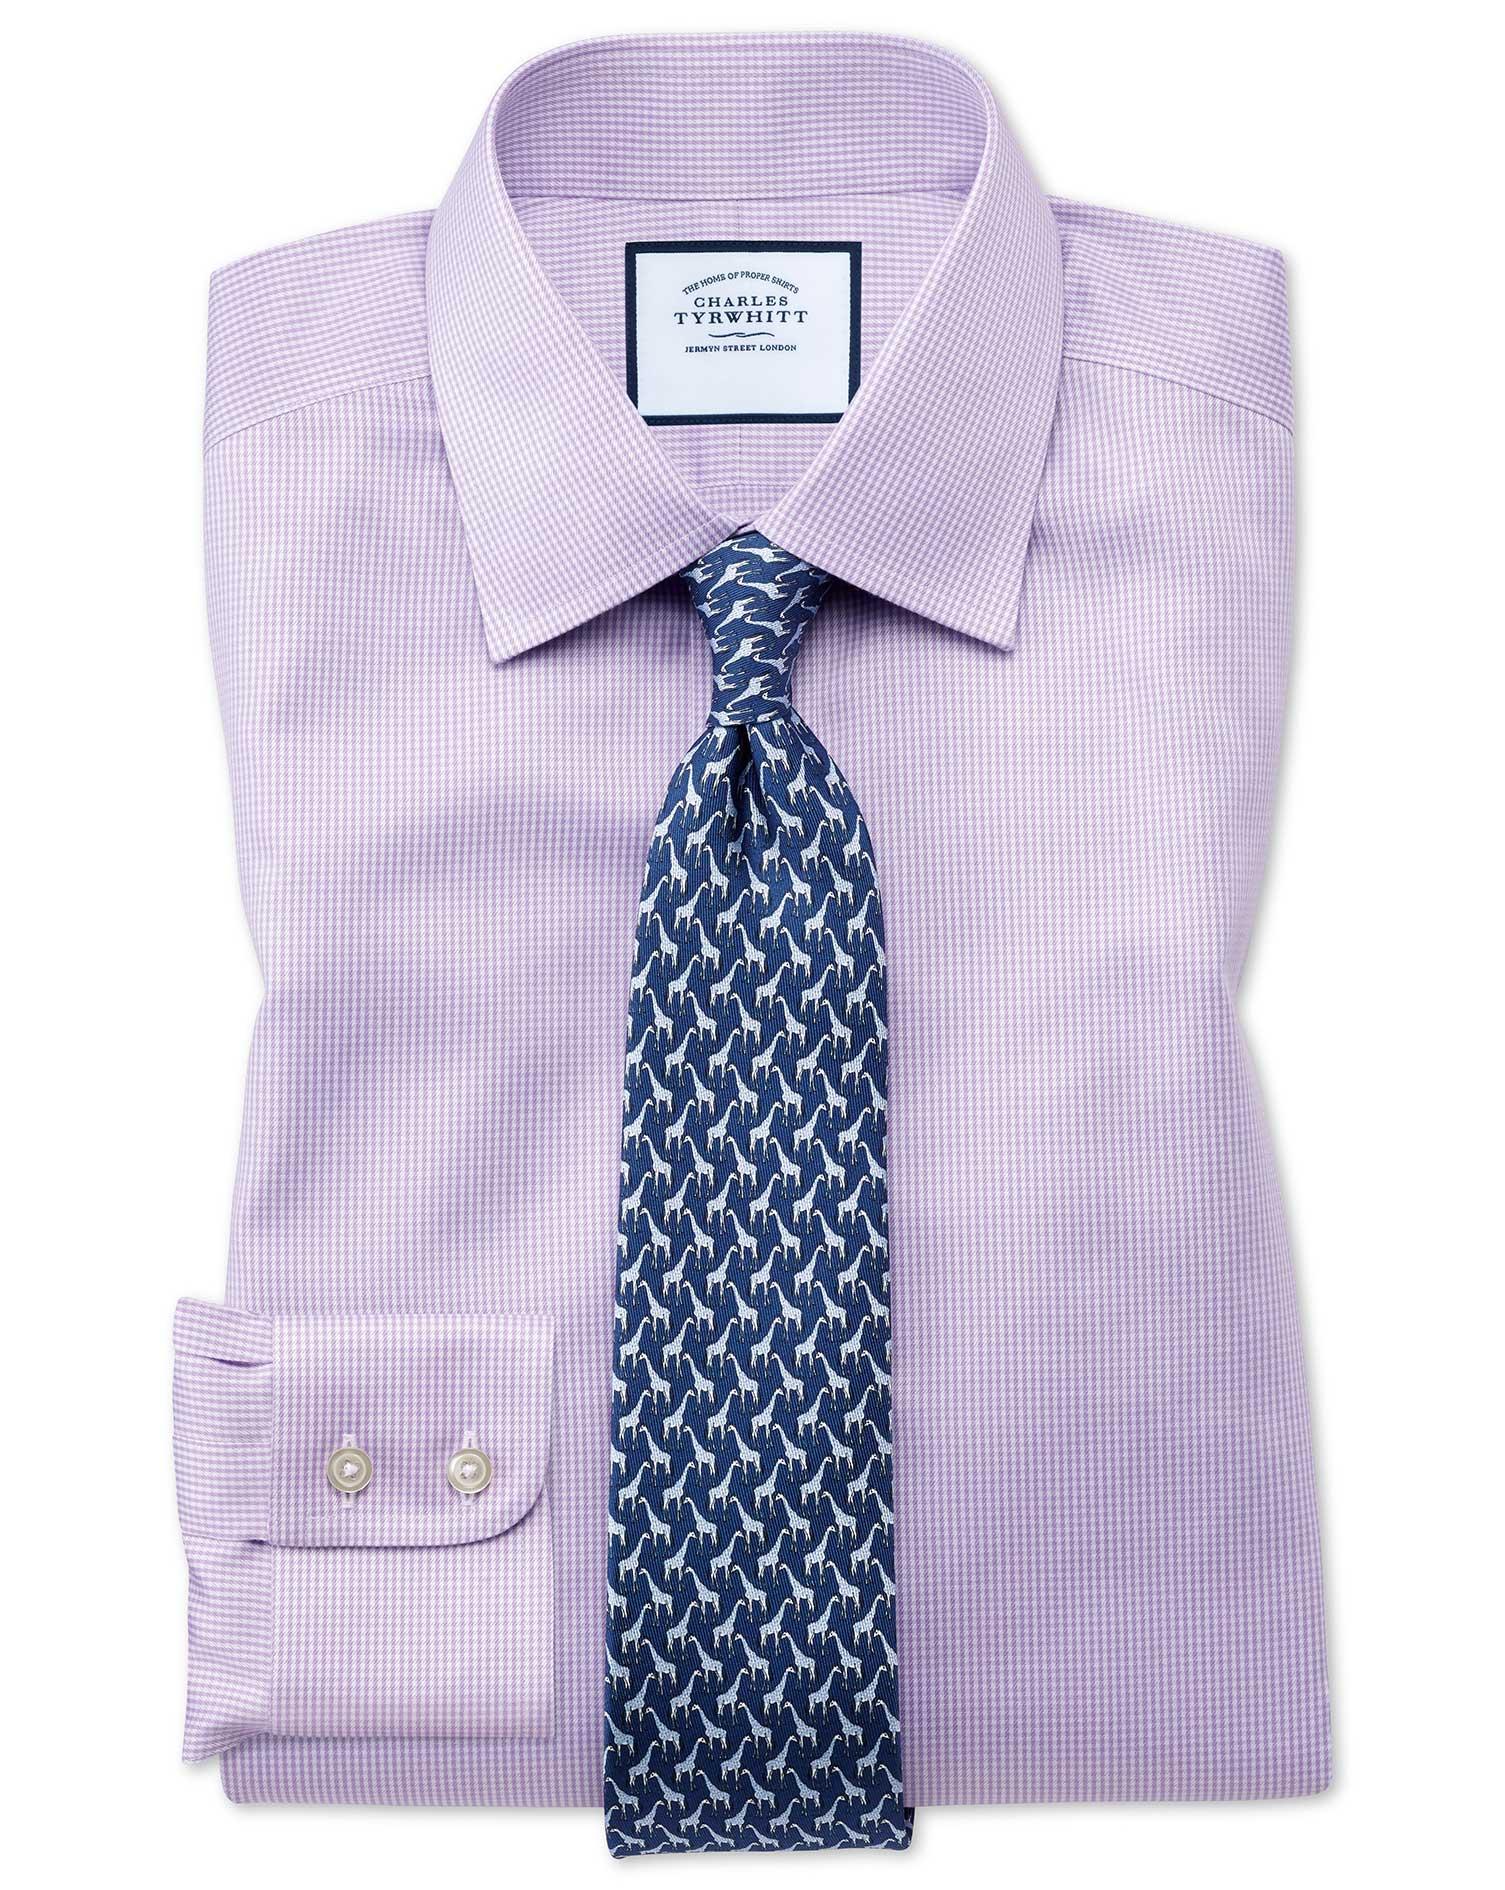 Classic Fit Non Iron Puppytooth Lilac Shirt Charles Tyrwhitt